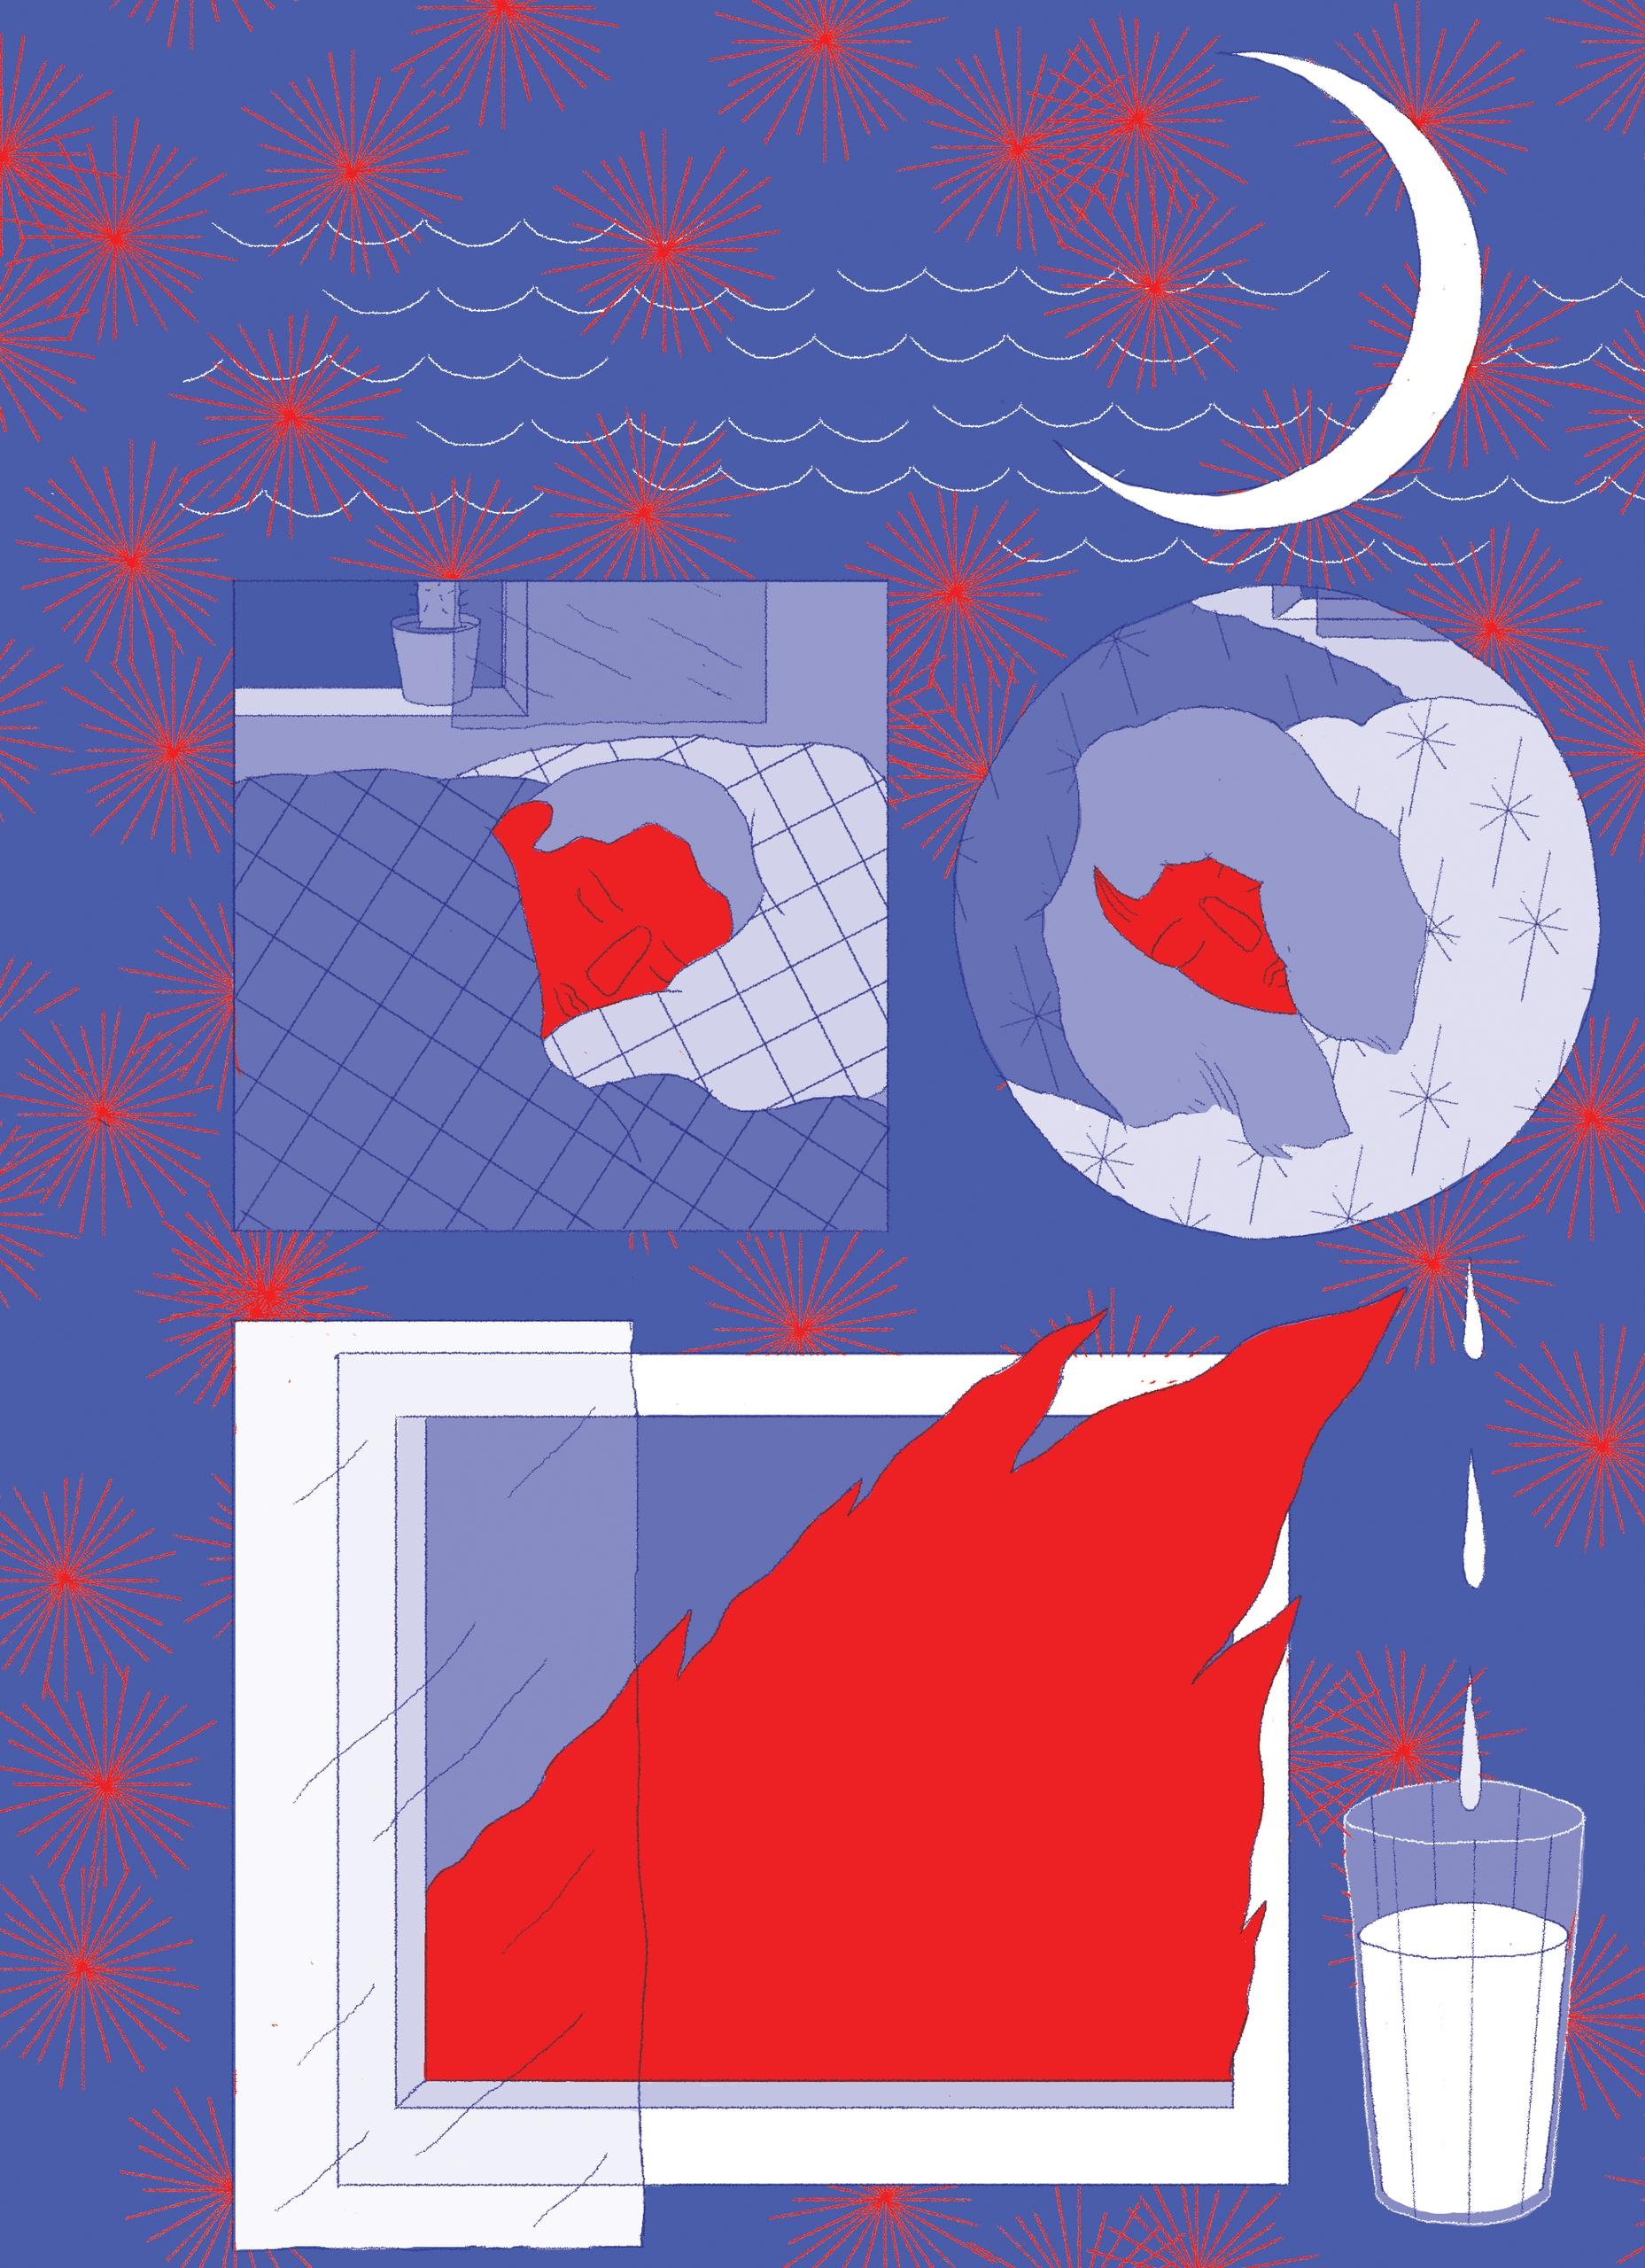 HEAT flow sleep dreams time fir - margot-dreams | ello